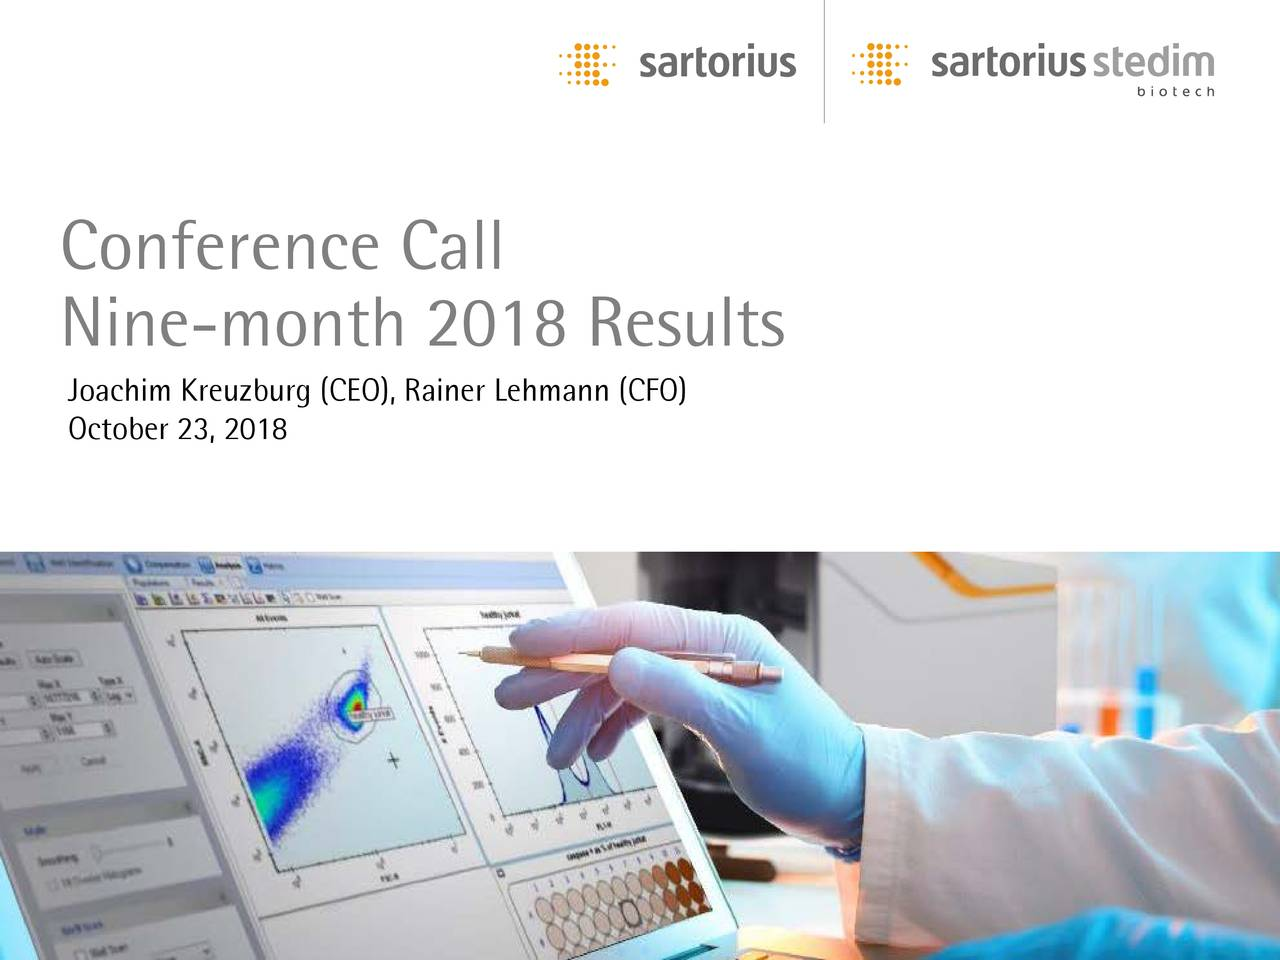 Nine-month 2018 Results October 23, 2018g (CEO), Rainer Lehmann (CFO)